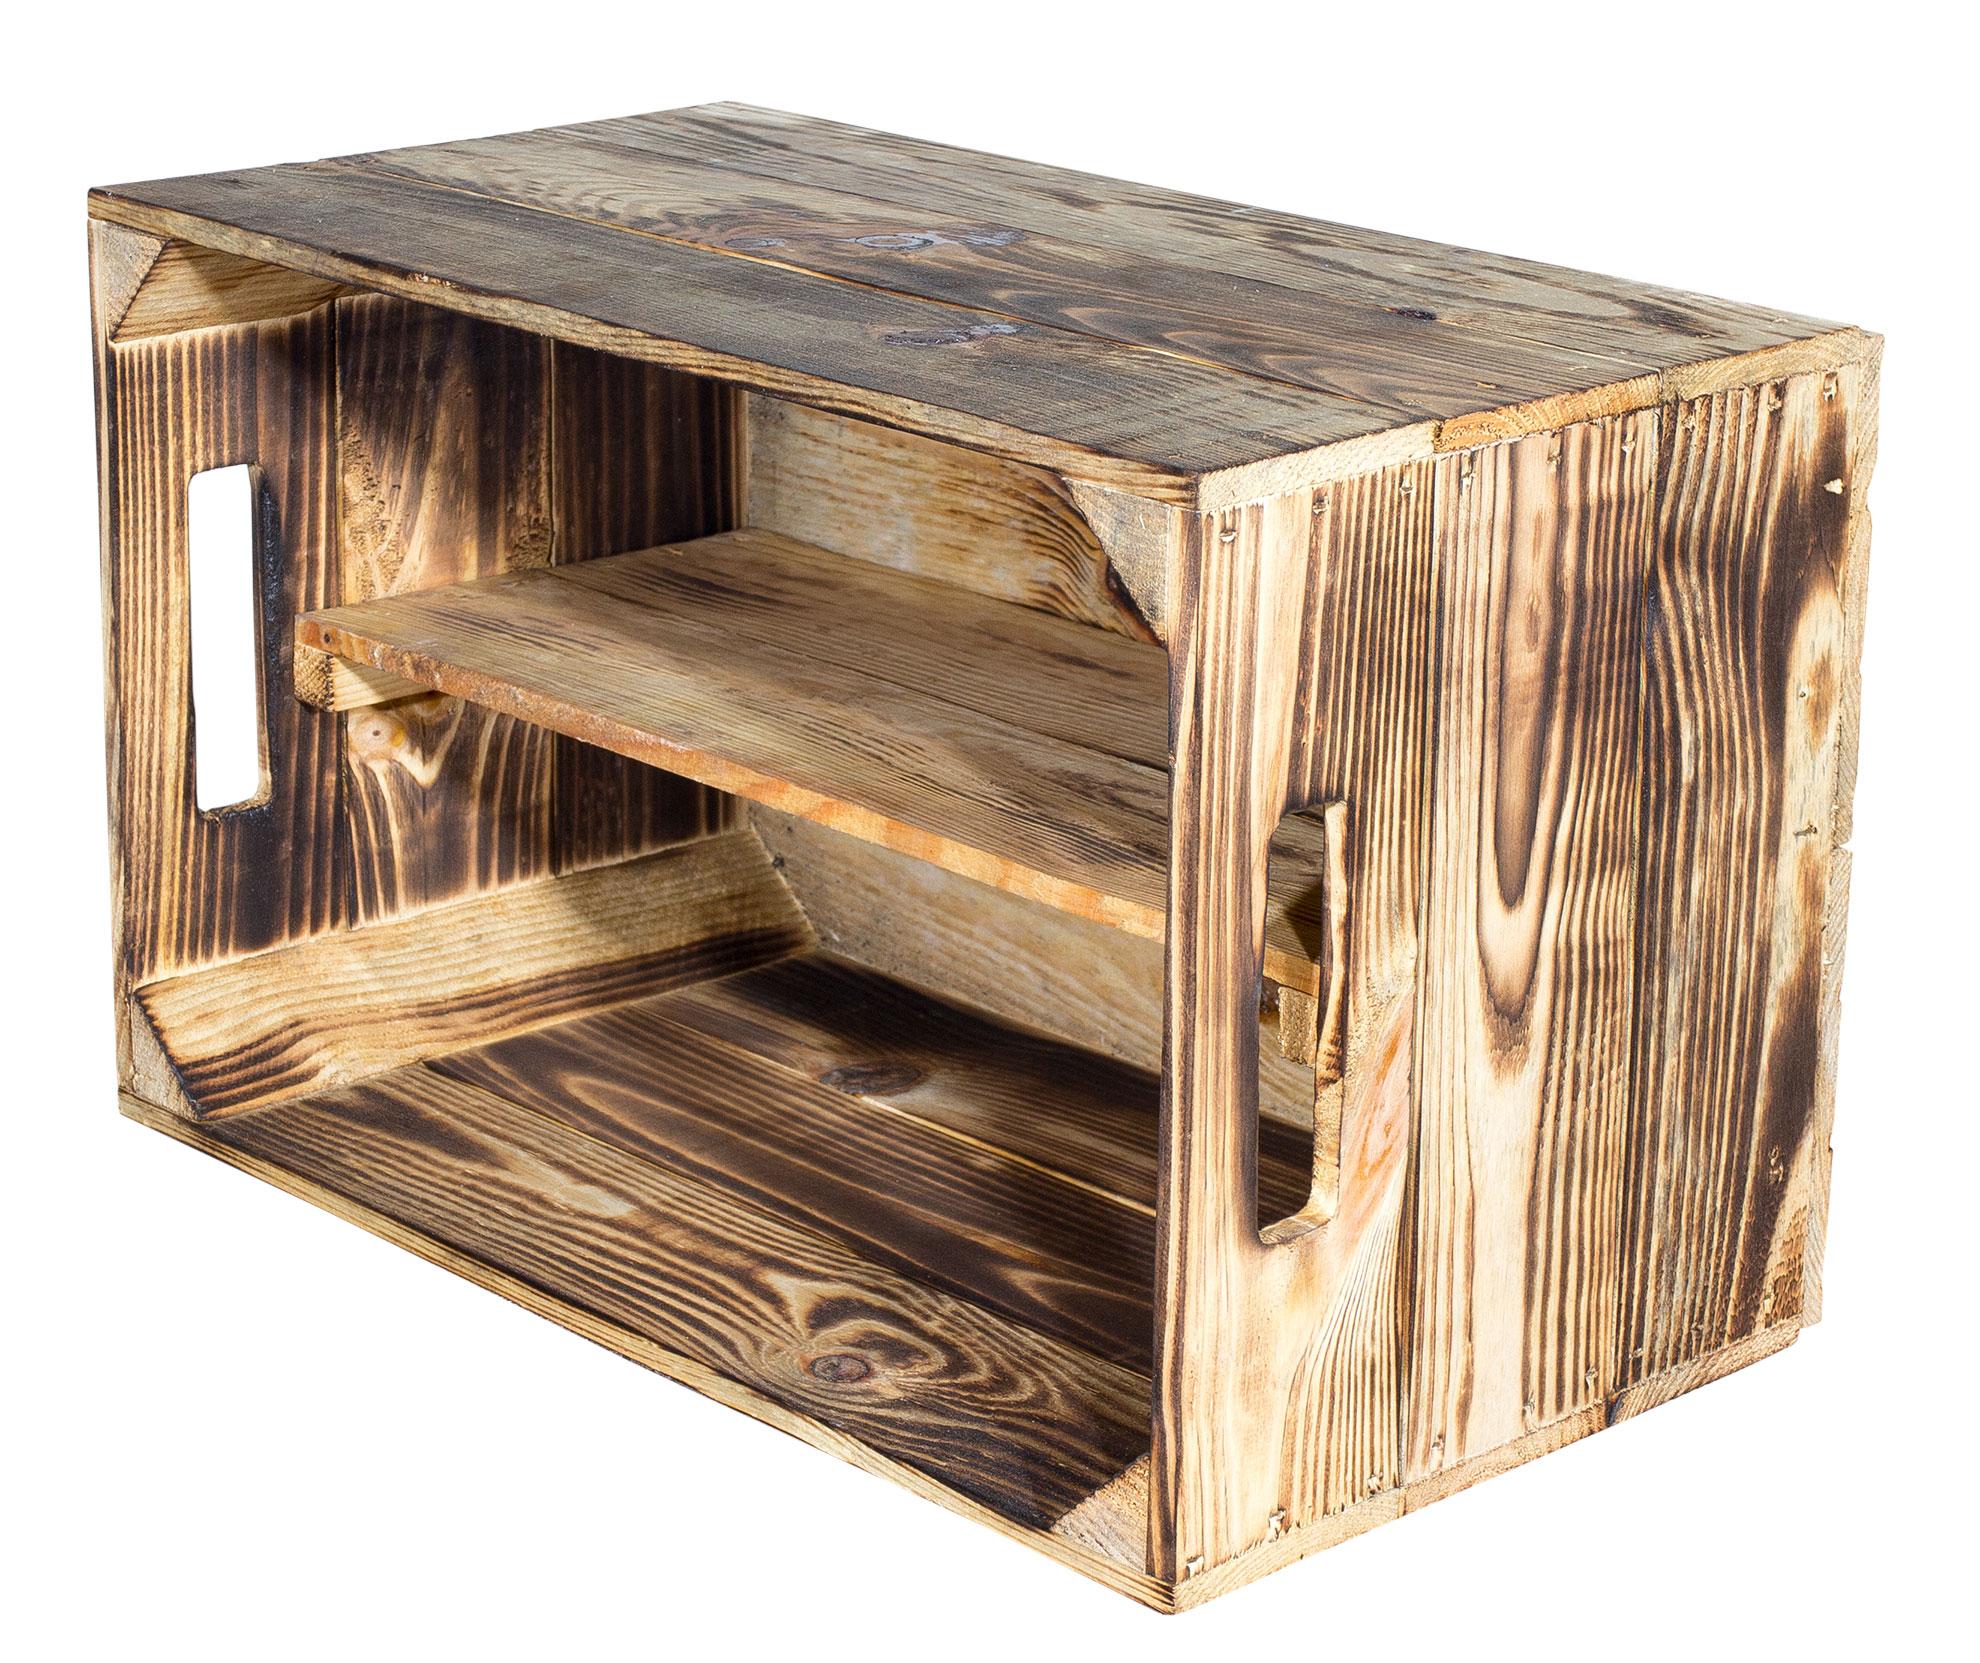 geflammte kisten geflammte birnenkiste mit mittelbrett. Black Bedroom Furniture Sets. Home Design Ideas